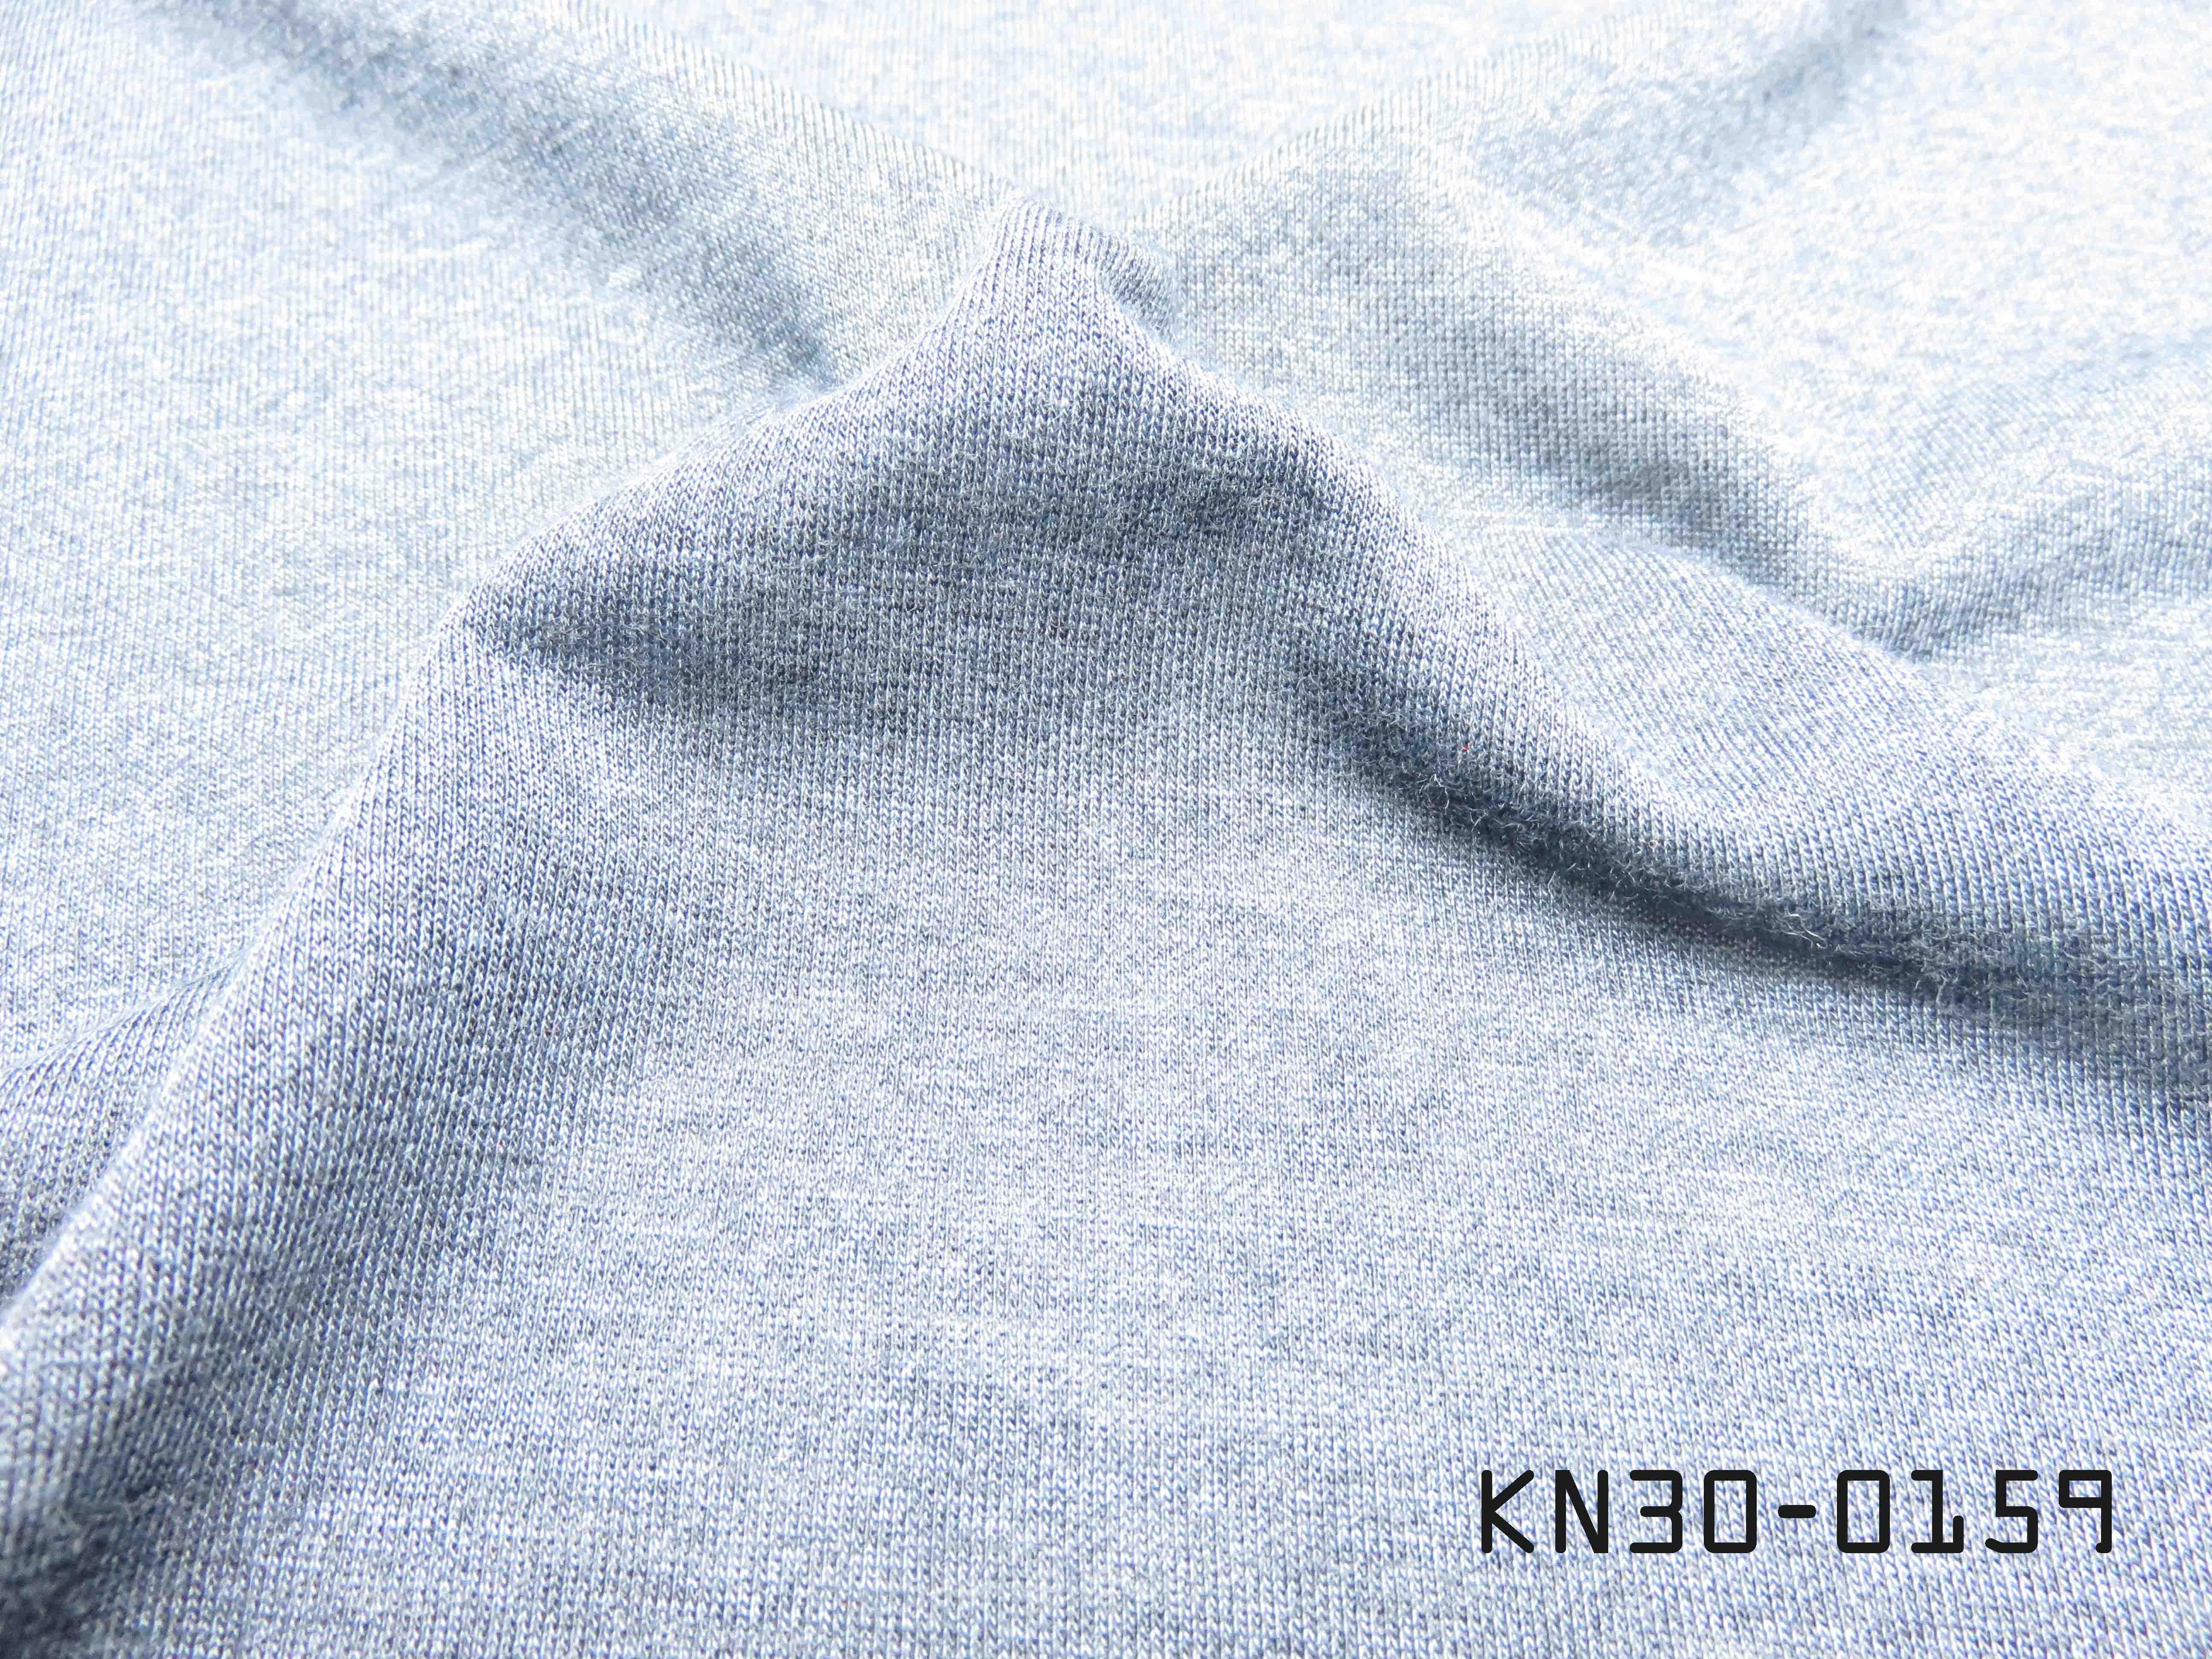 Kn30-0159